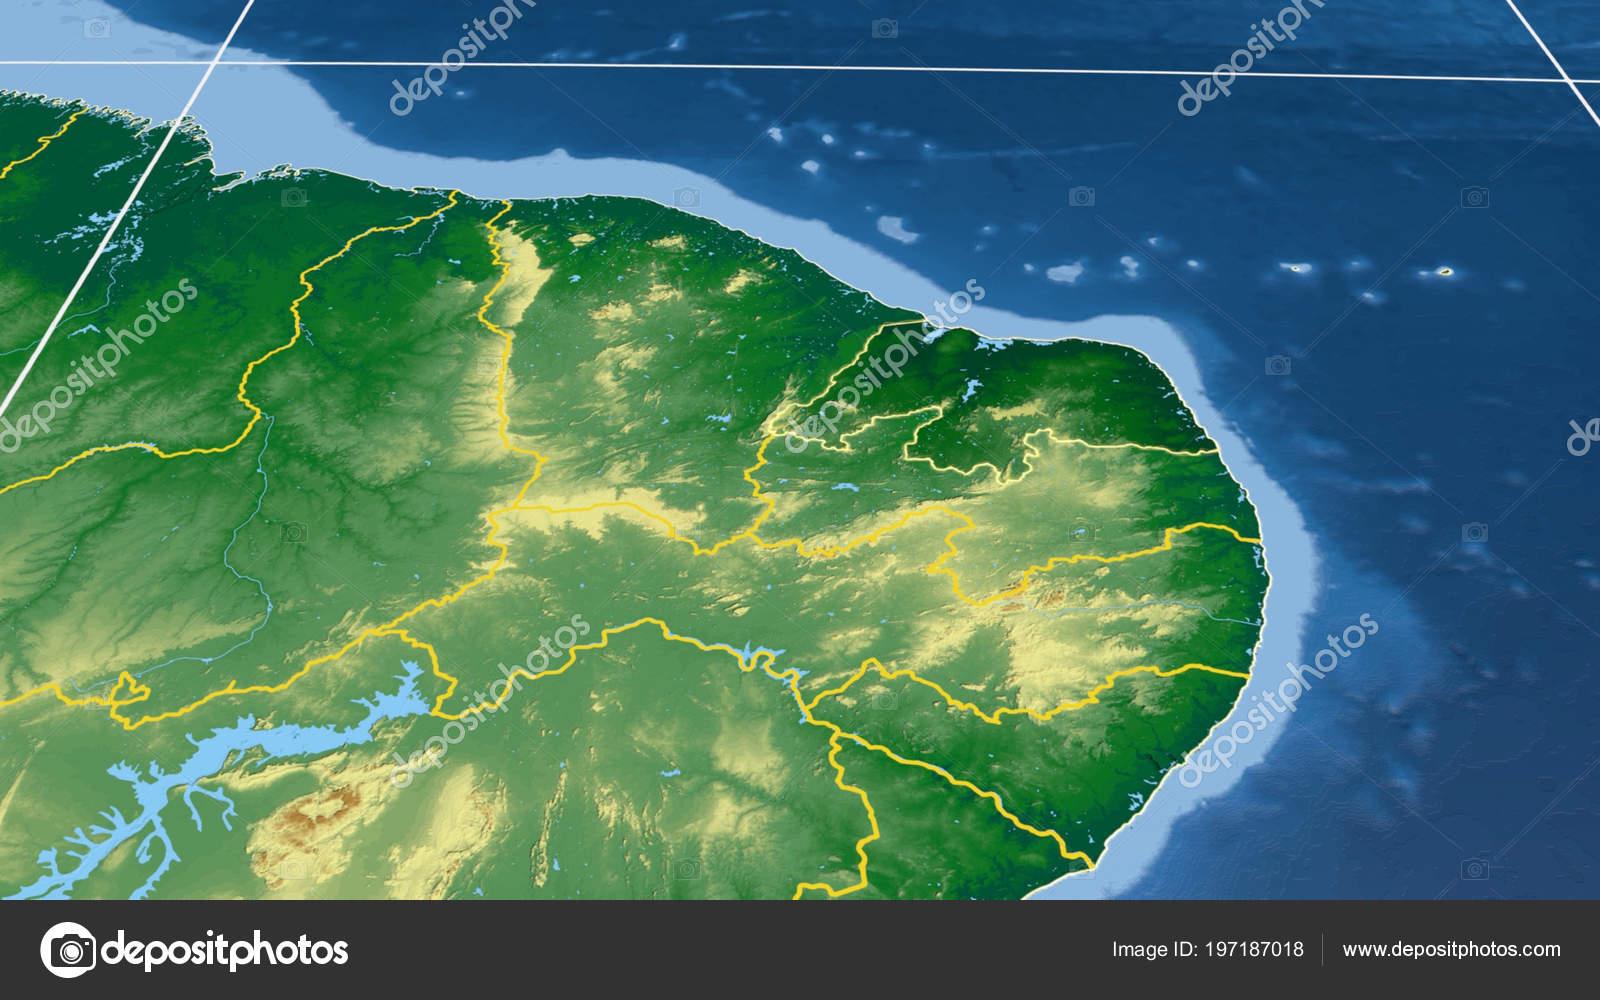 Rio Grande Mapa Fisico.Rio Grande Norte Regiao Brasil Delineado Mapa Fisico Cor